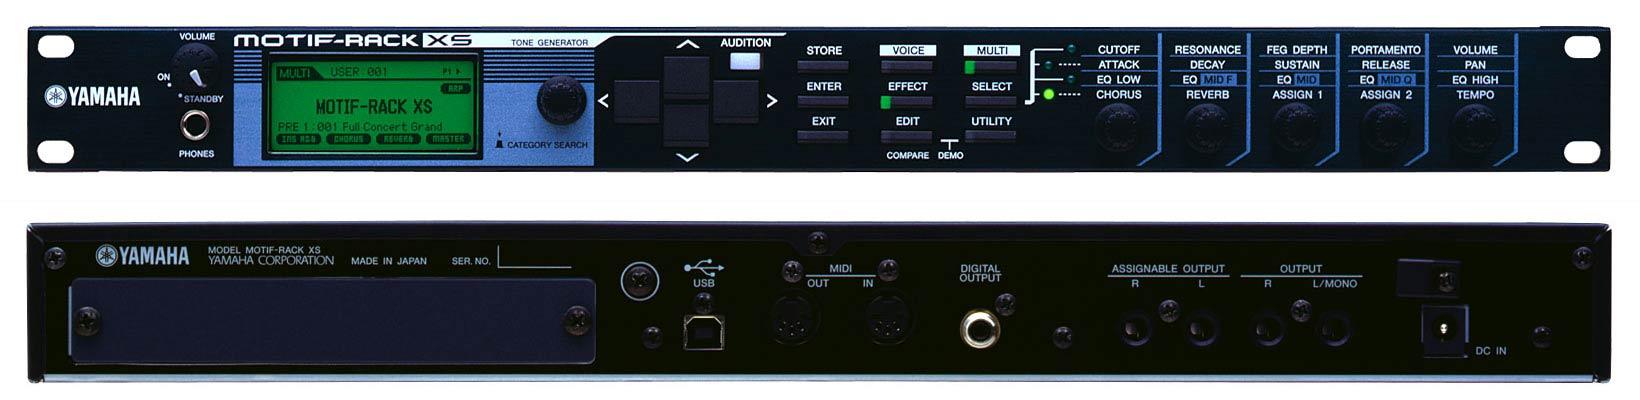 analog gear synths modules yamaha motif rack xs alternate mode inc. Black Bedroom Furniture Sets. Home Design Ideas